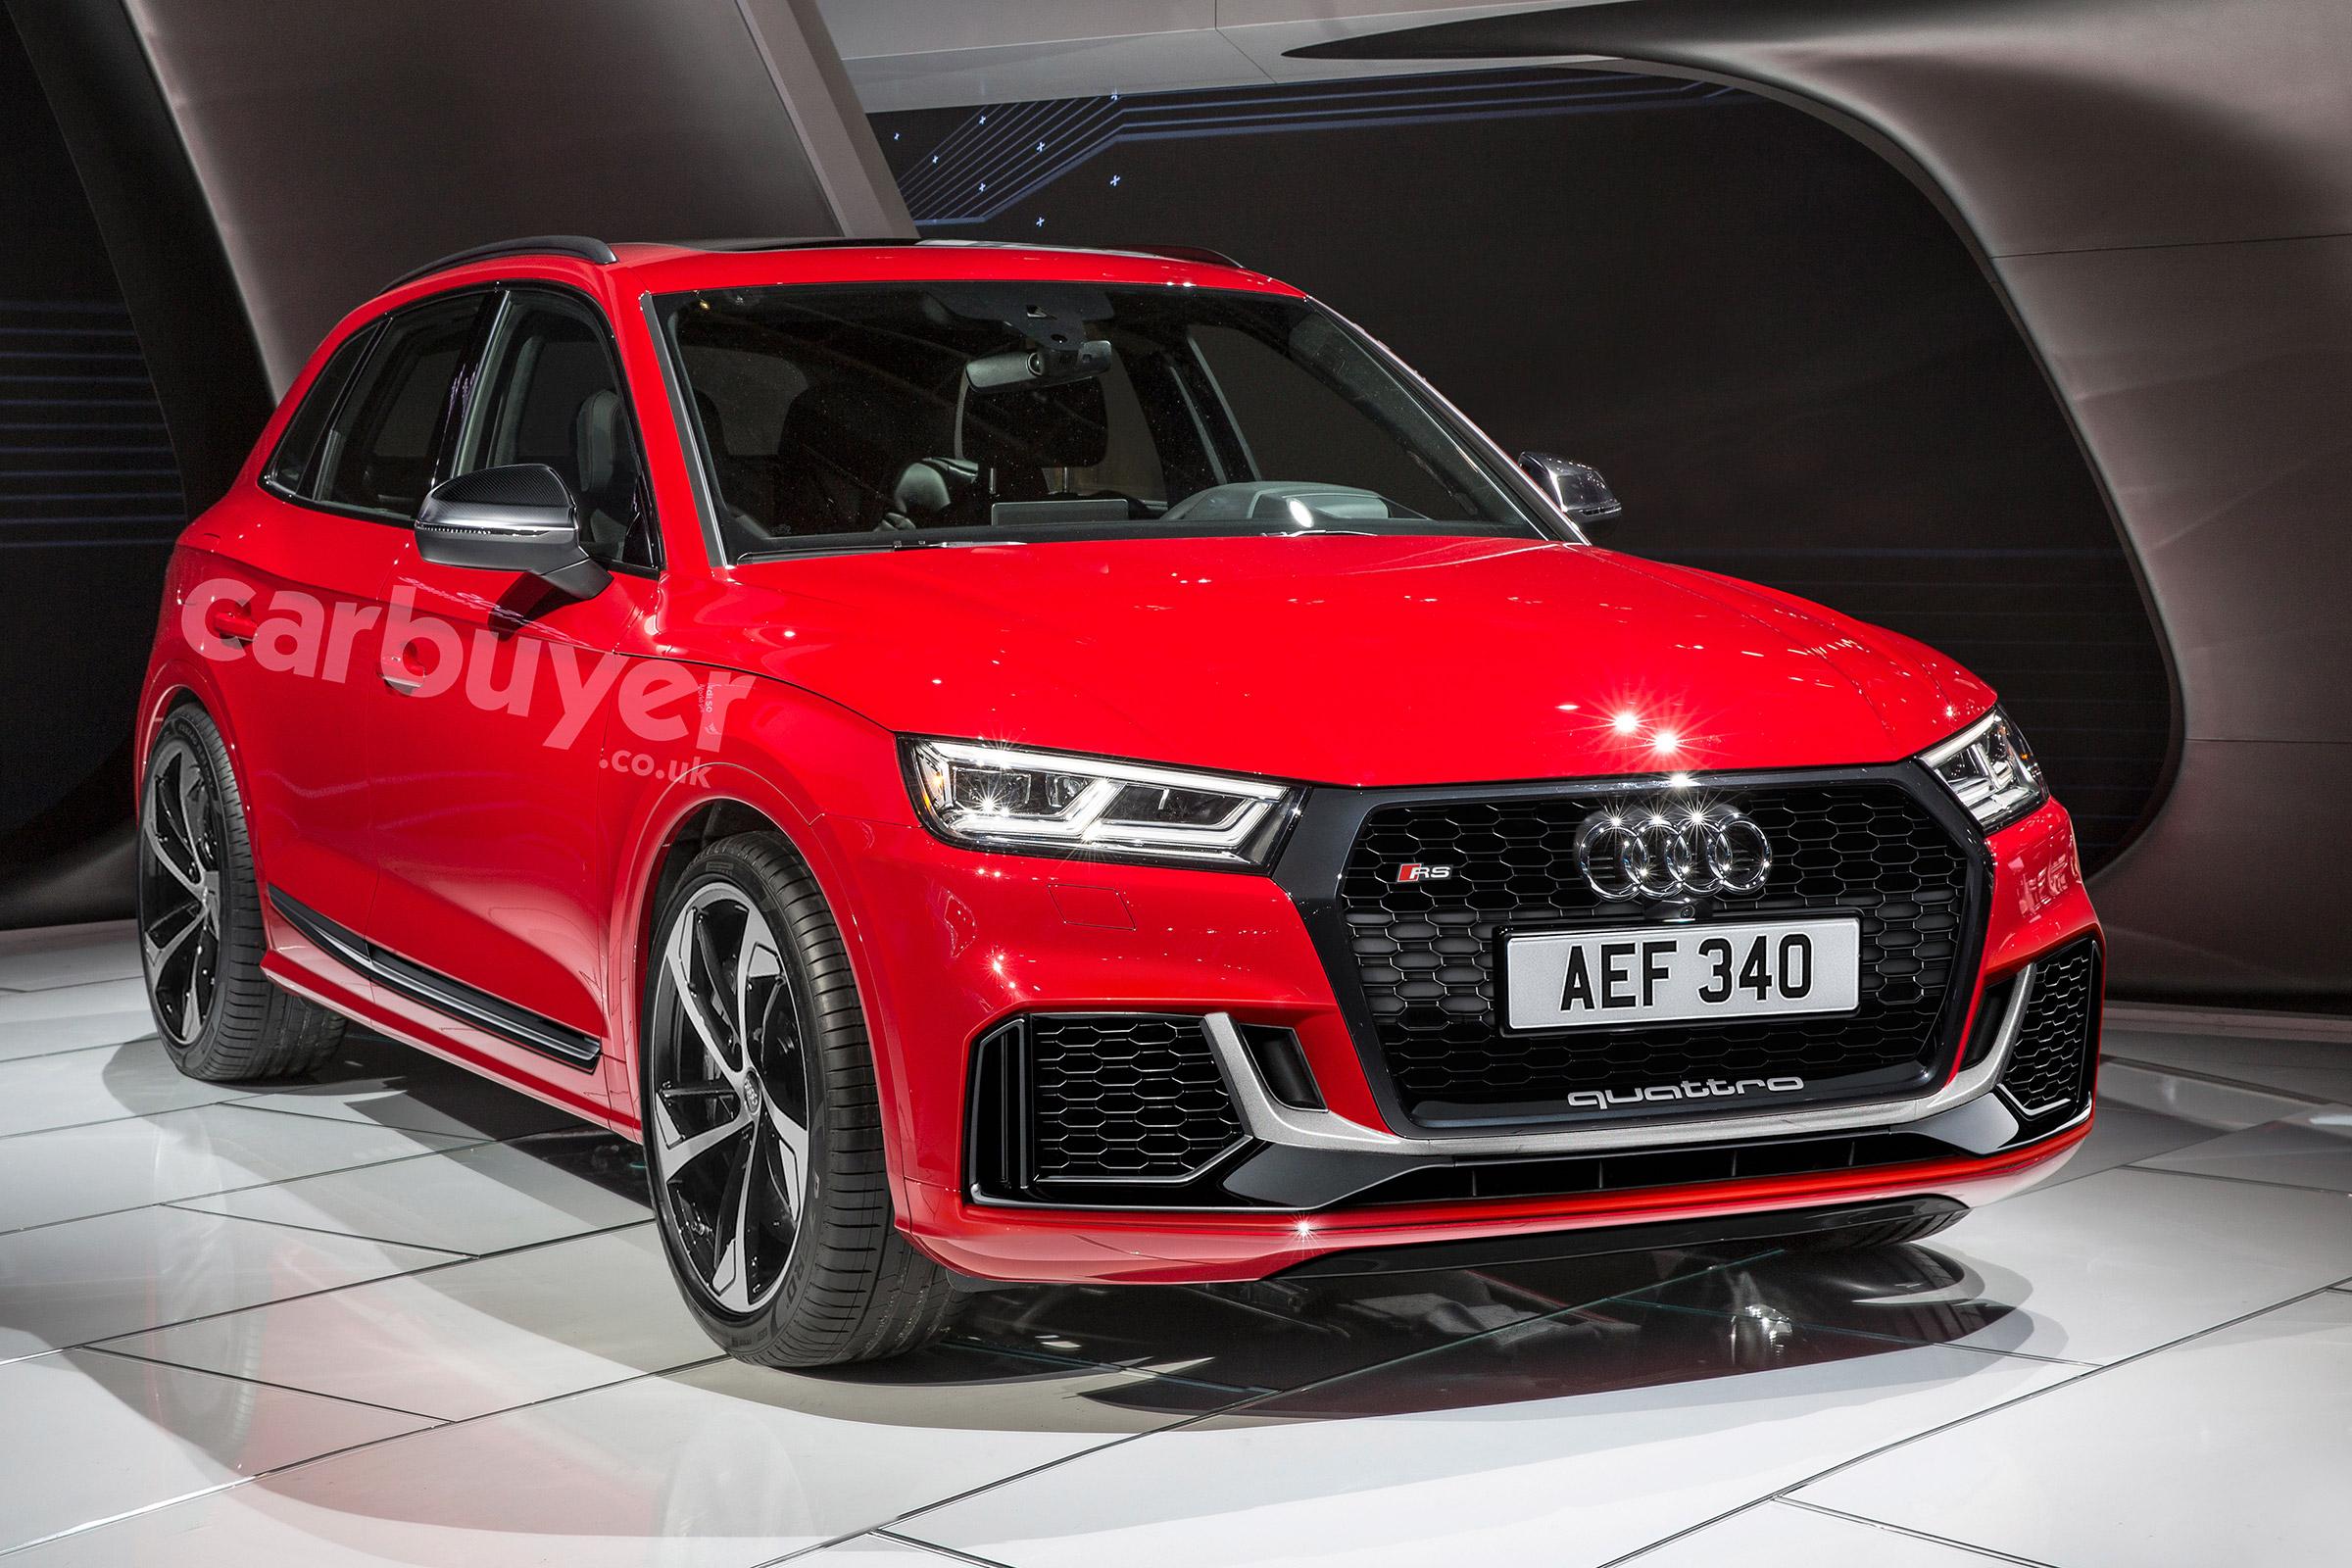 Kelebihan Kekurangan Audi Rs Q5 Review